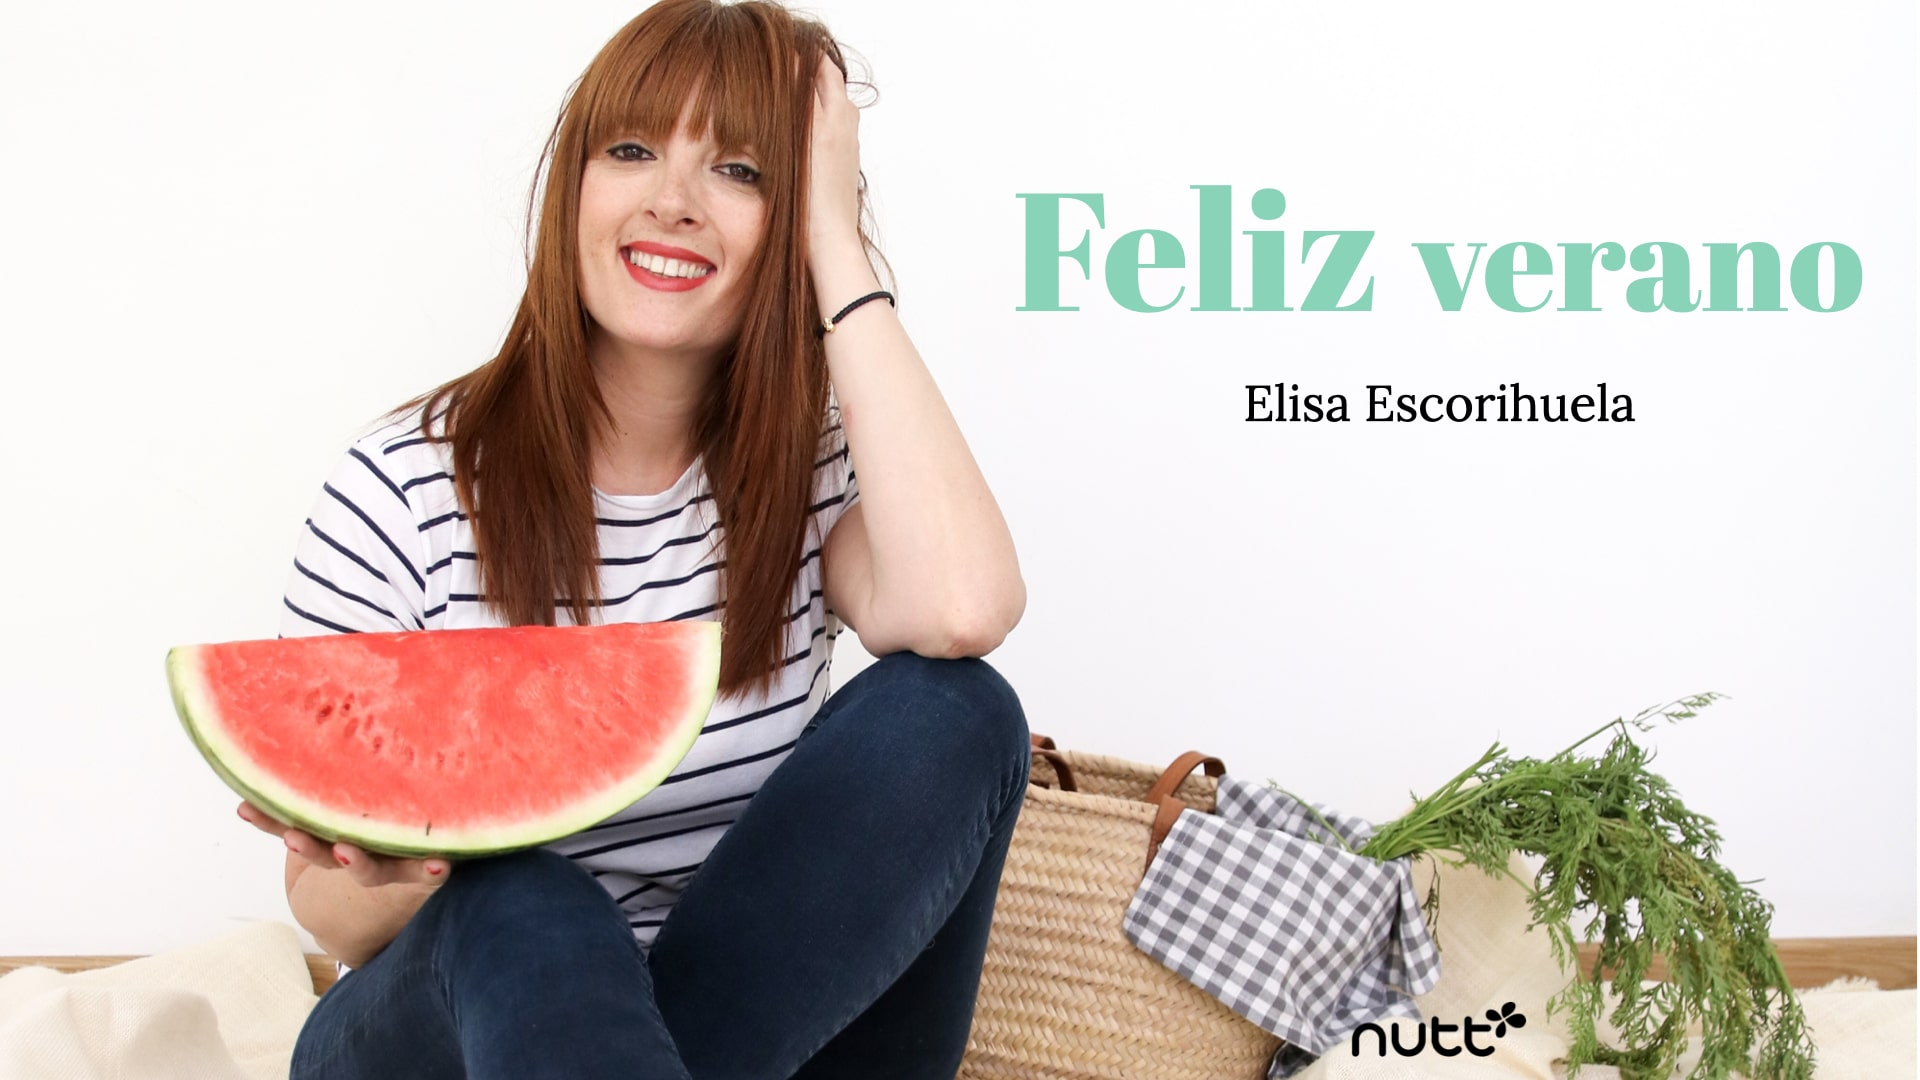 Feliz verano Elisa Escorihuela